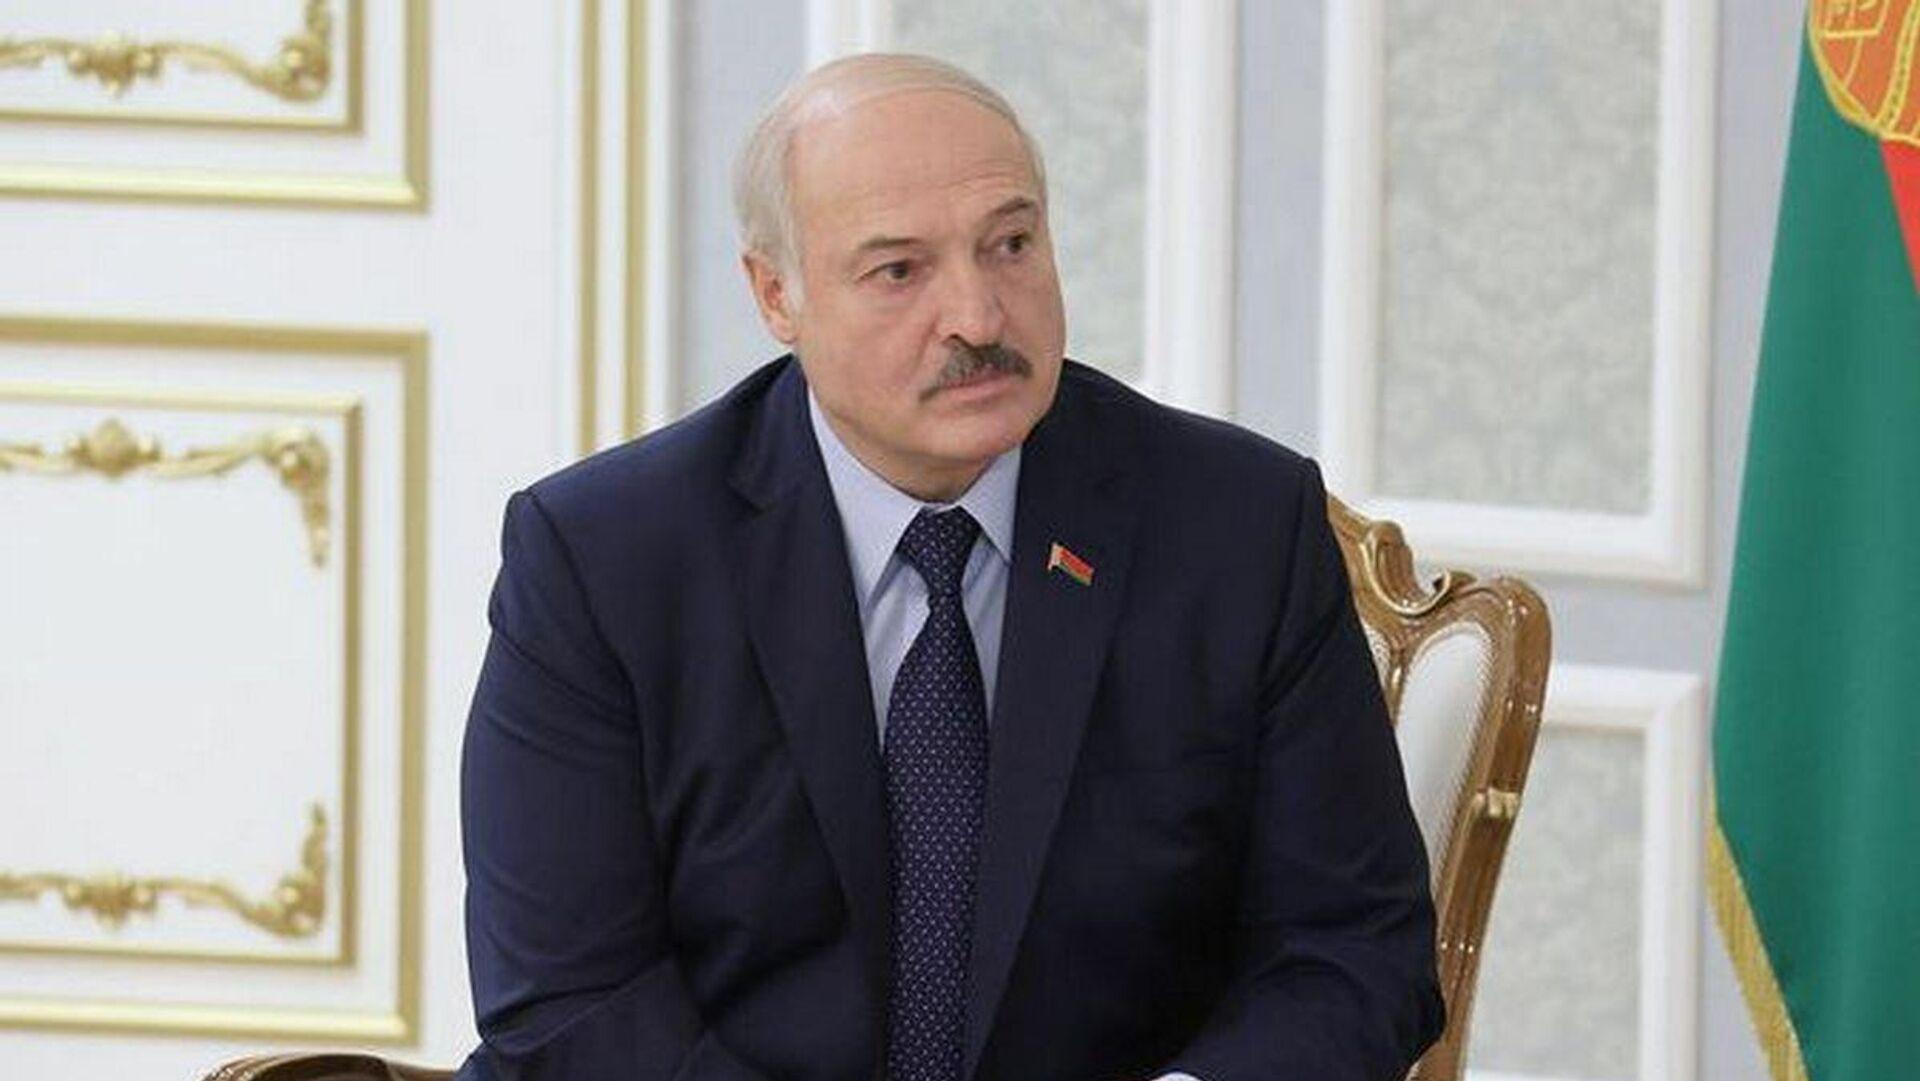 Президент Беларуси Александр Лукашенко - Sputnik Беларусь, 1920, 14.10.2021